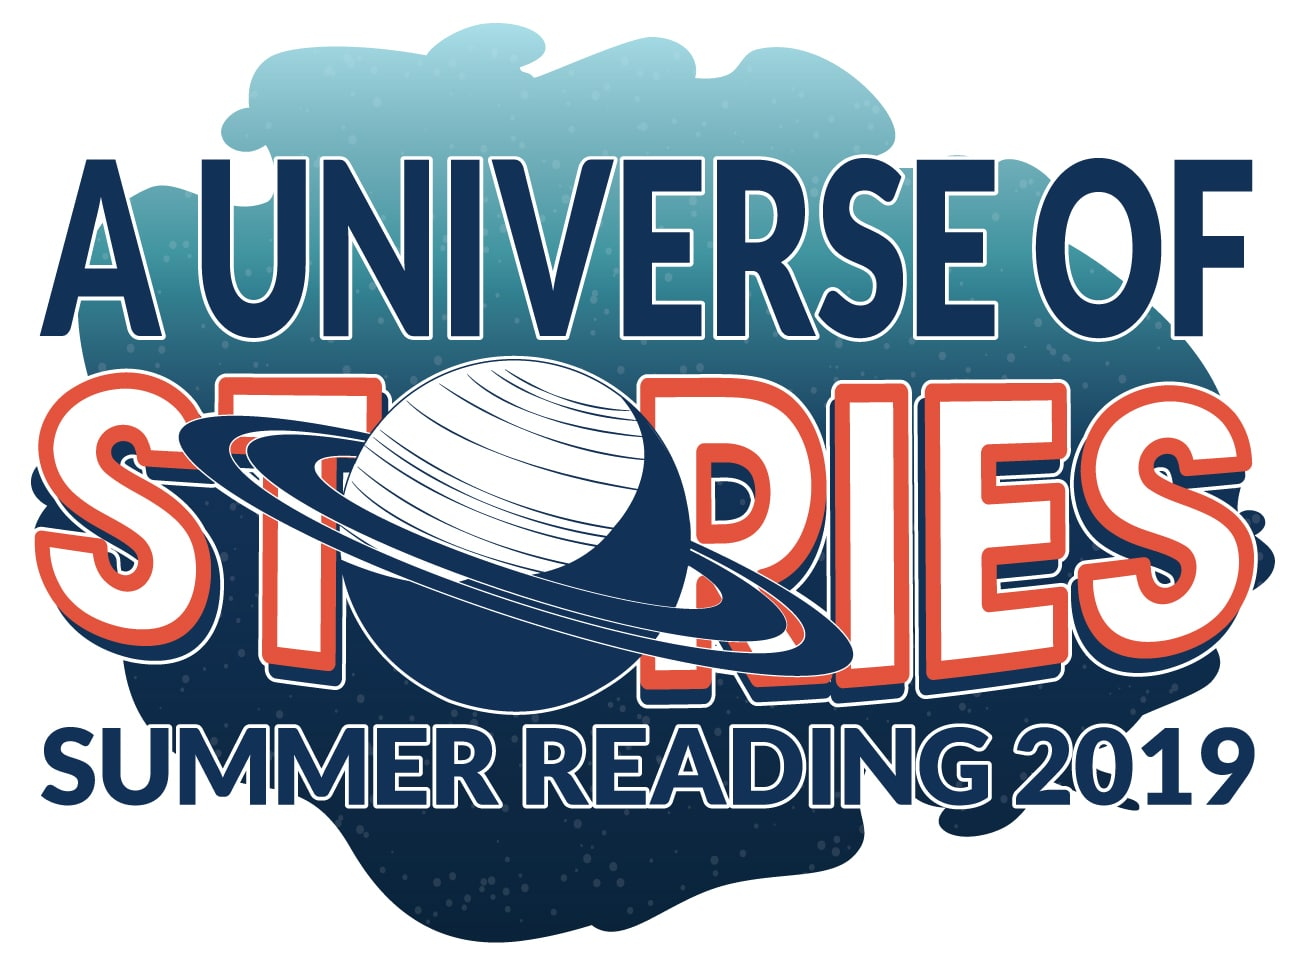 Reasons to Join the Vigo County Public Library Summer